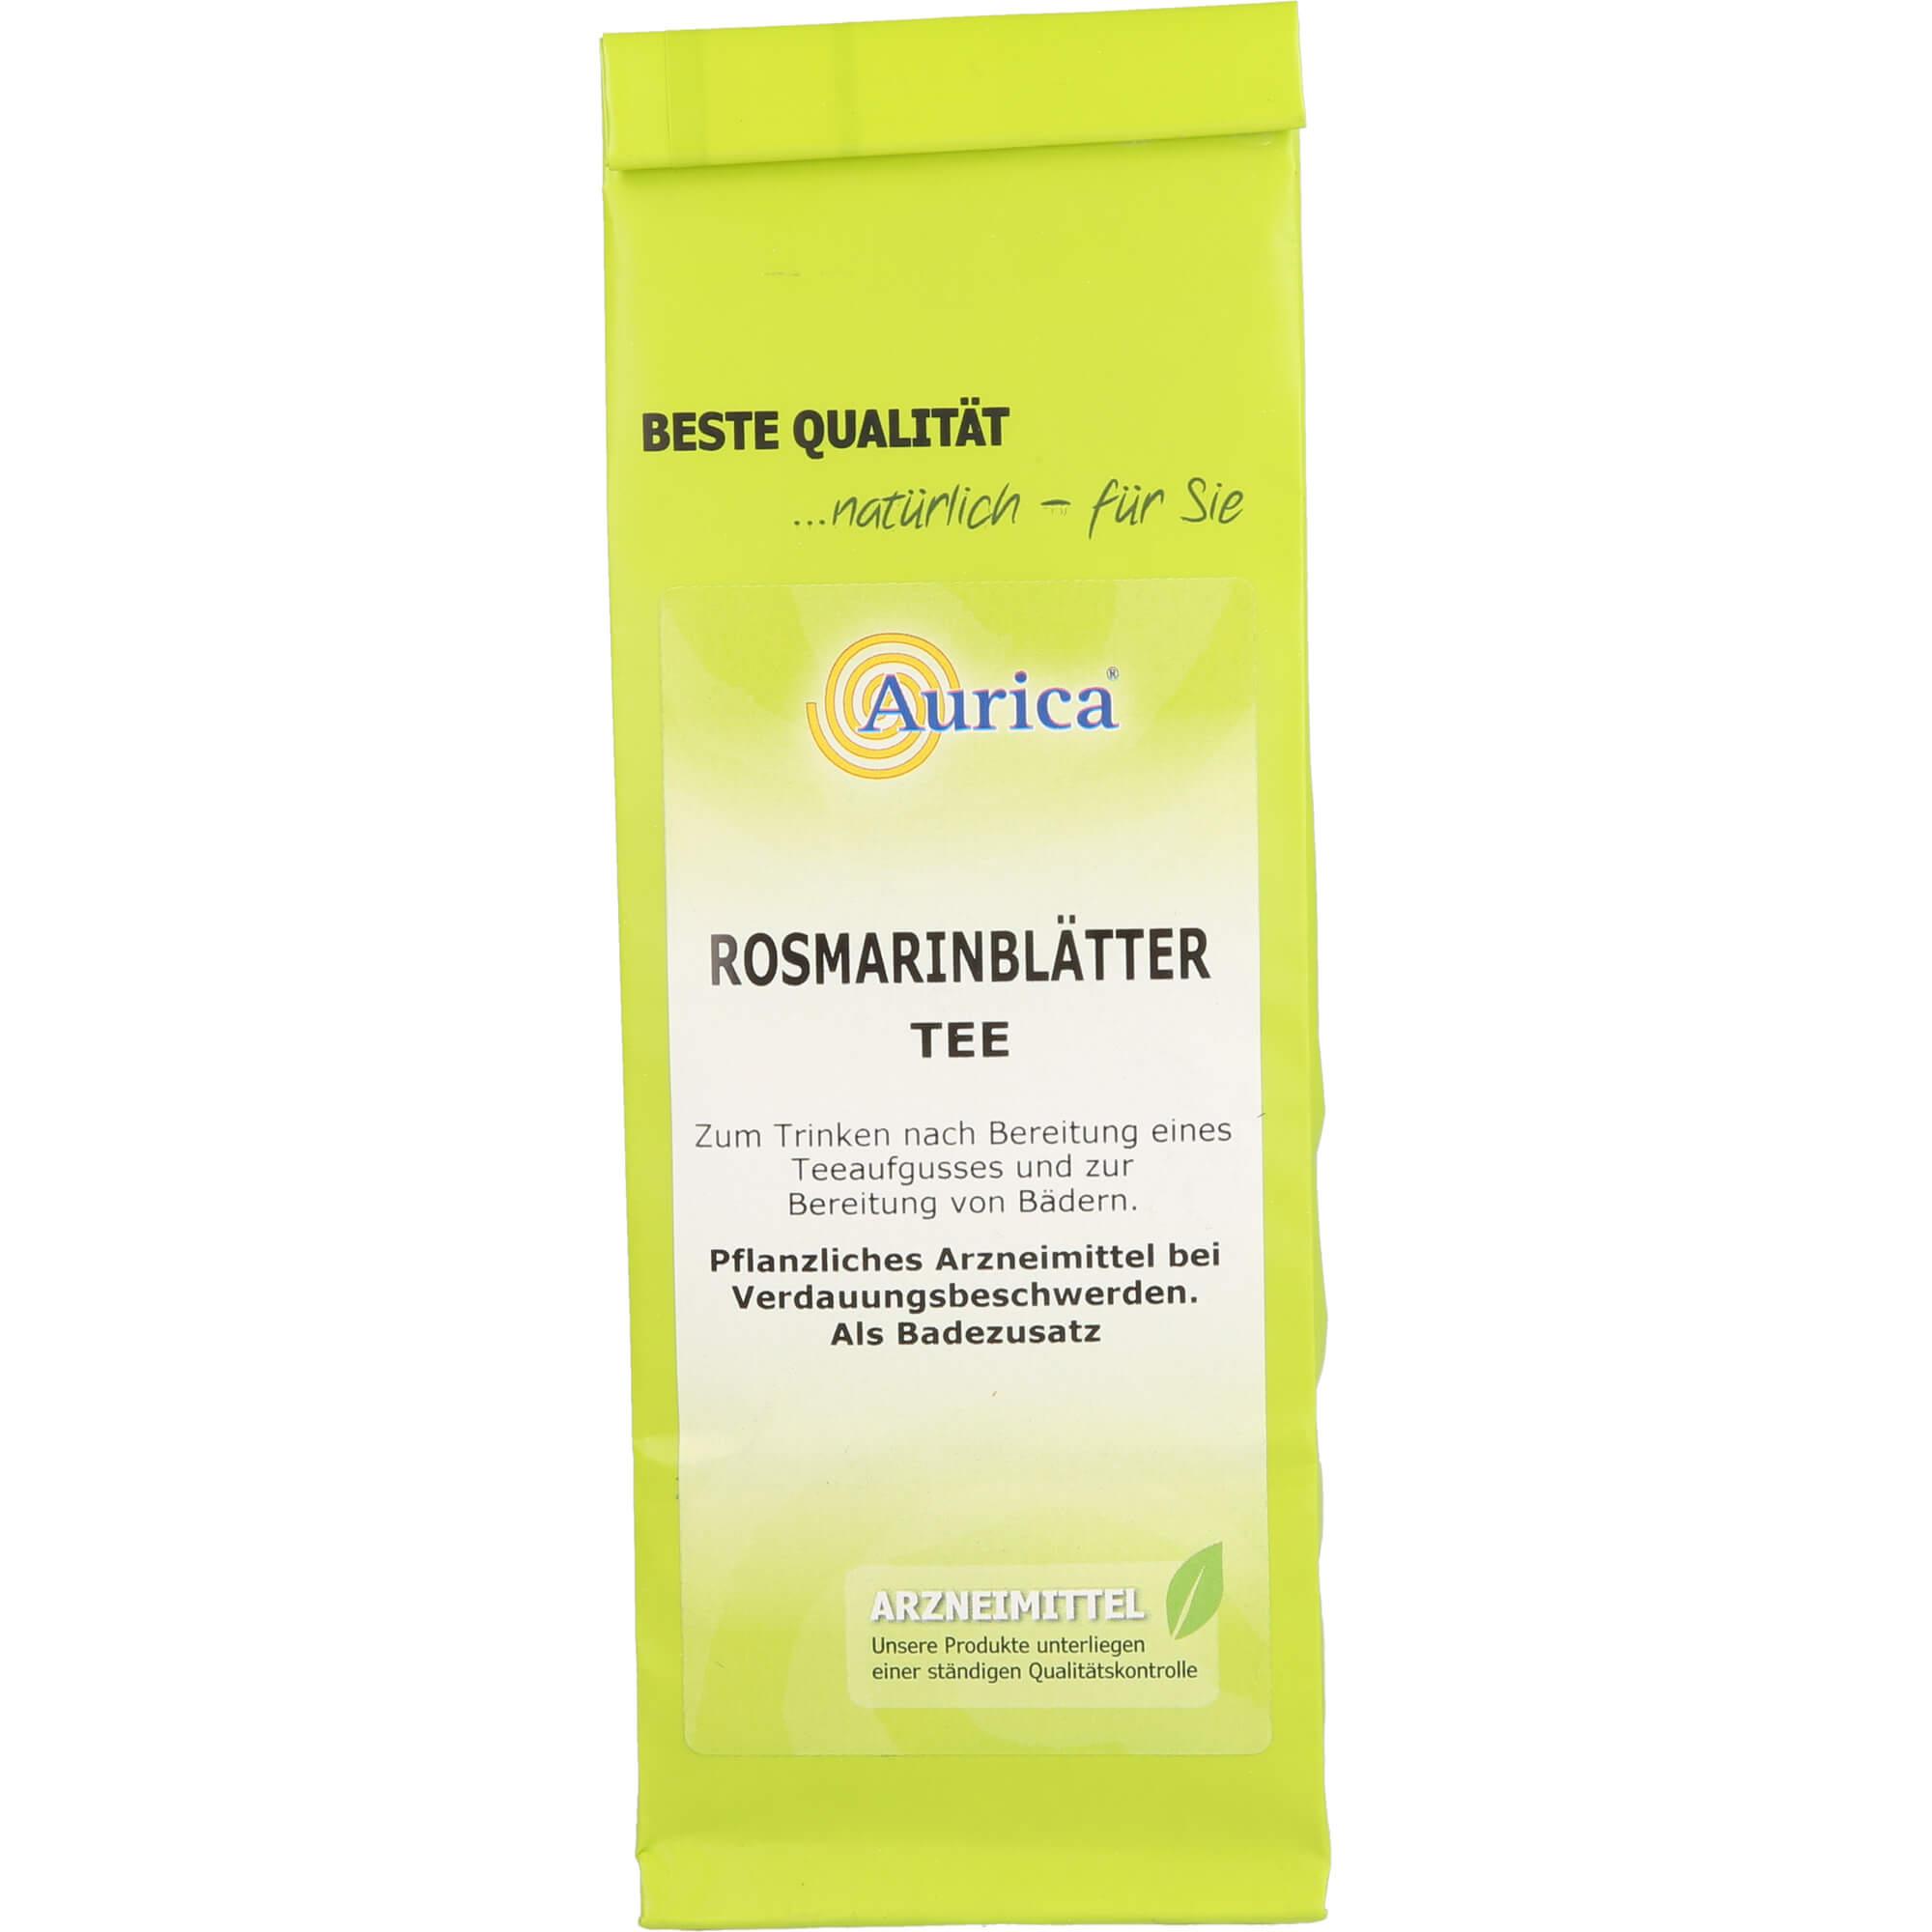 ROSMARINBLÄTTER Tee Aurica